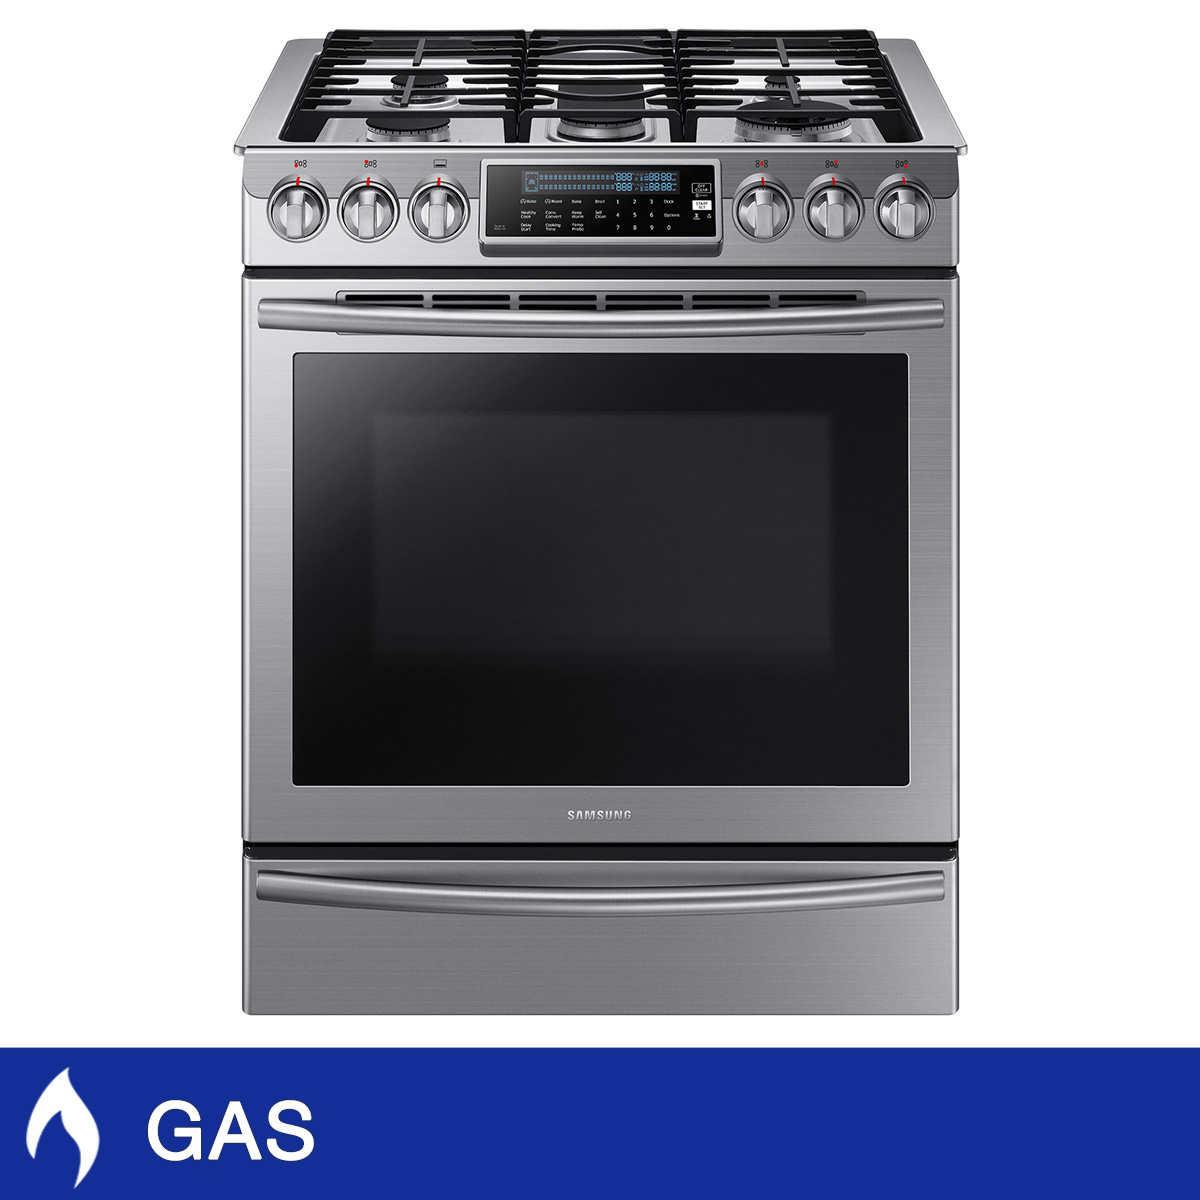 Uncategorized Kitchen Appliances Vancouver ranges costco 5 8 cu ft slide in gas range with intuitive controls